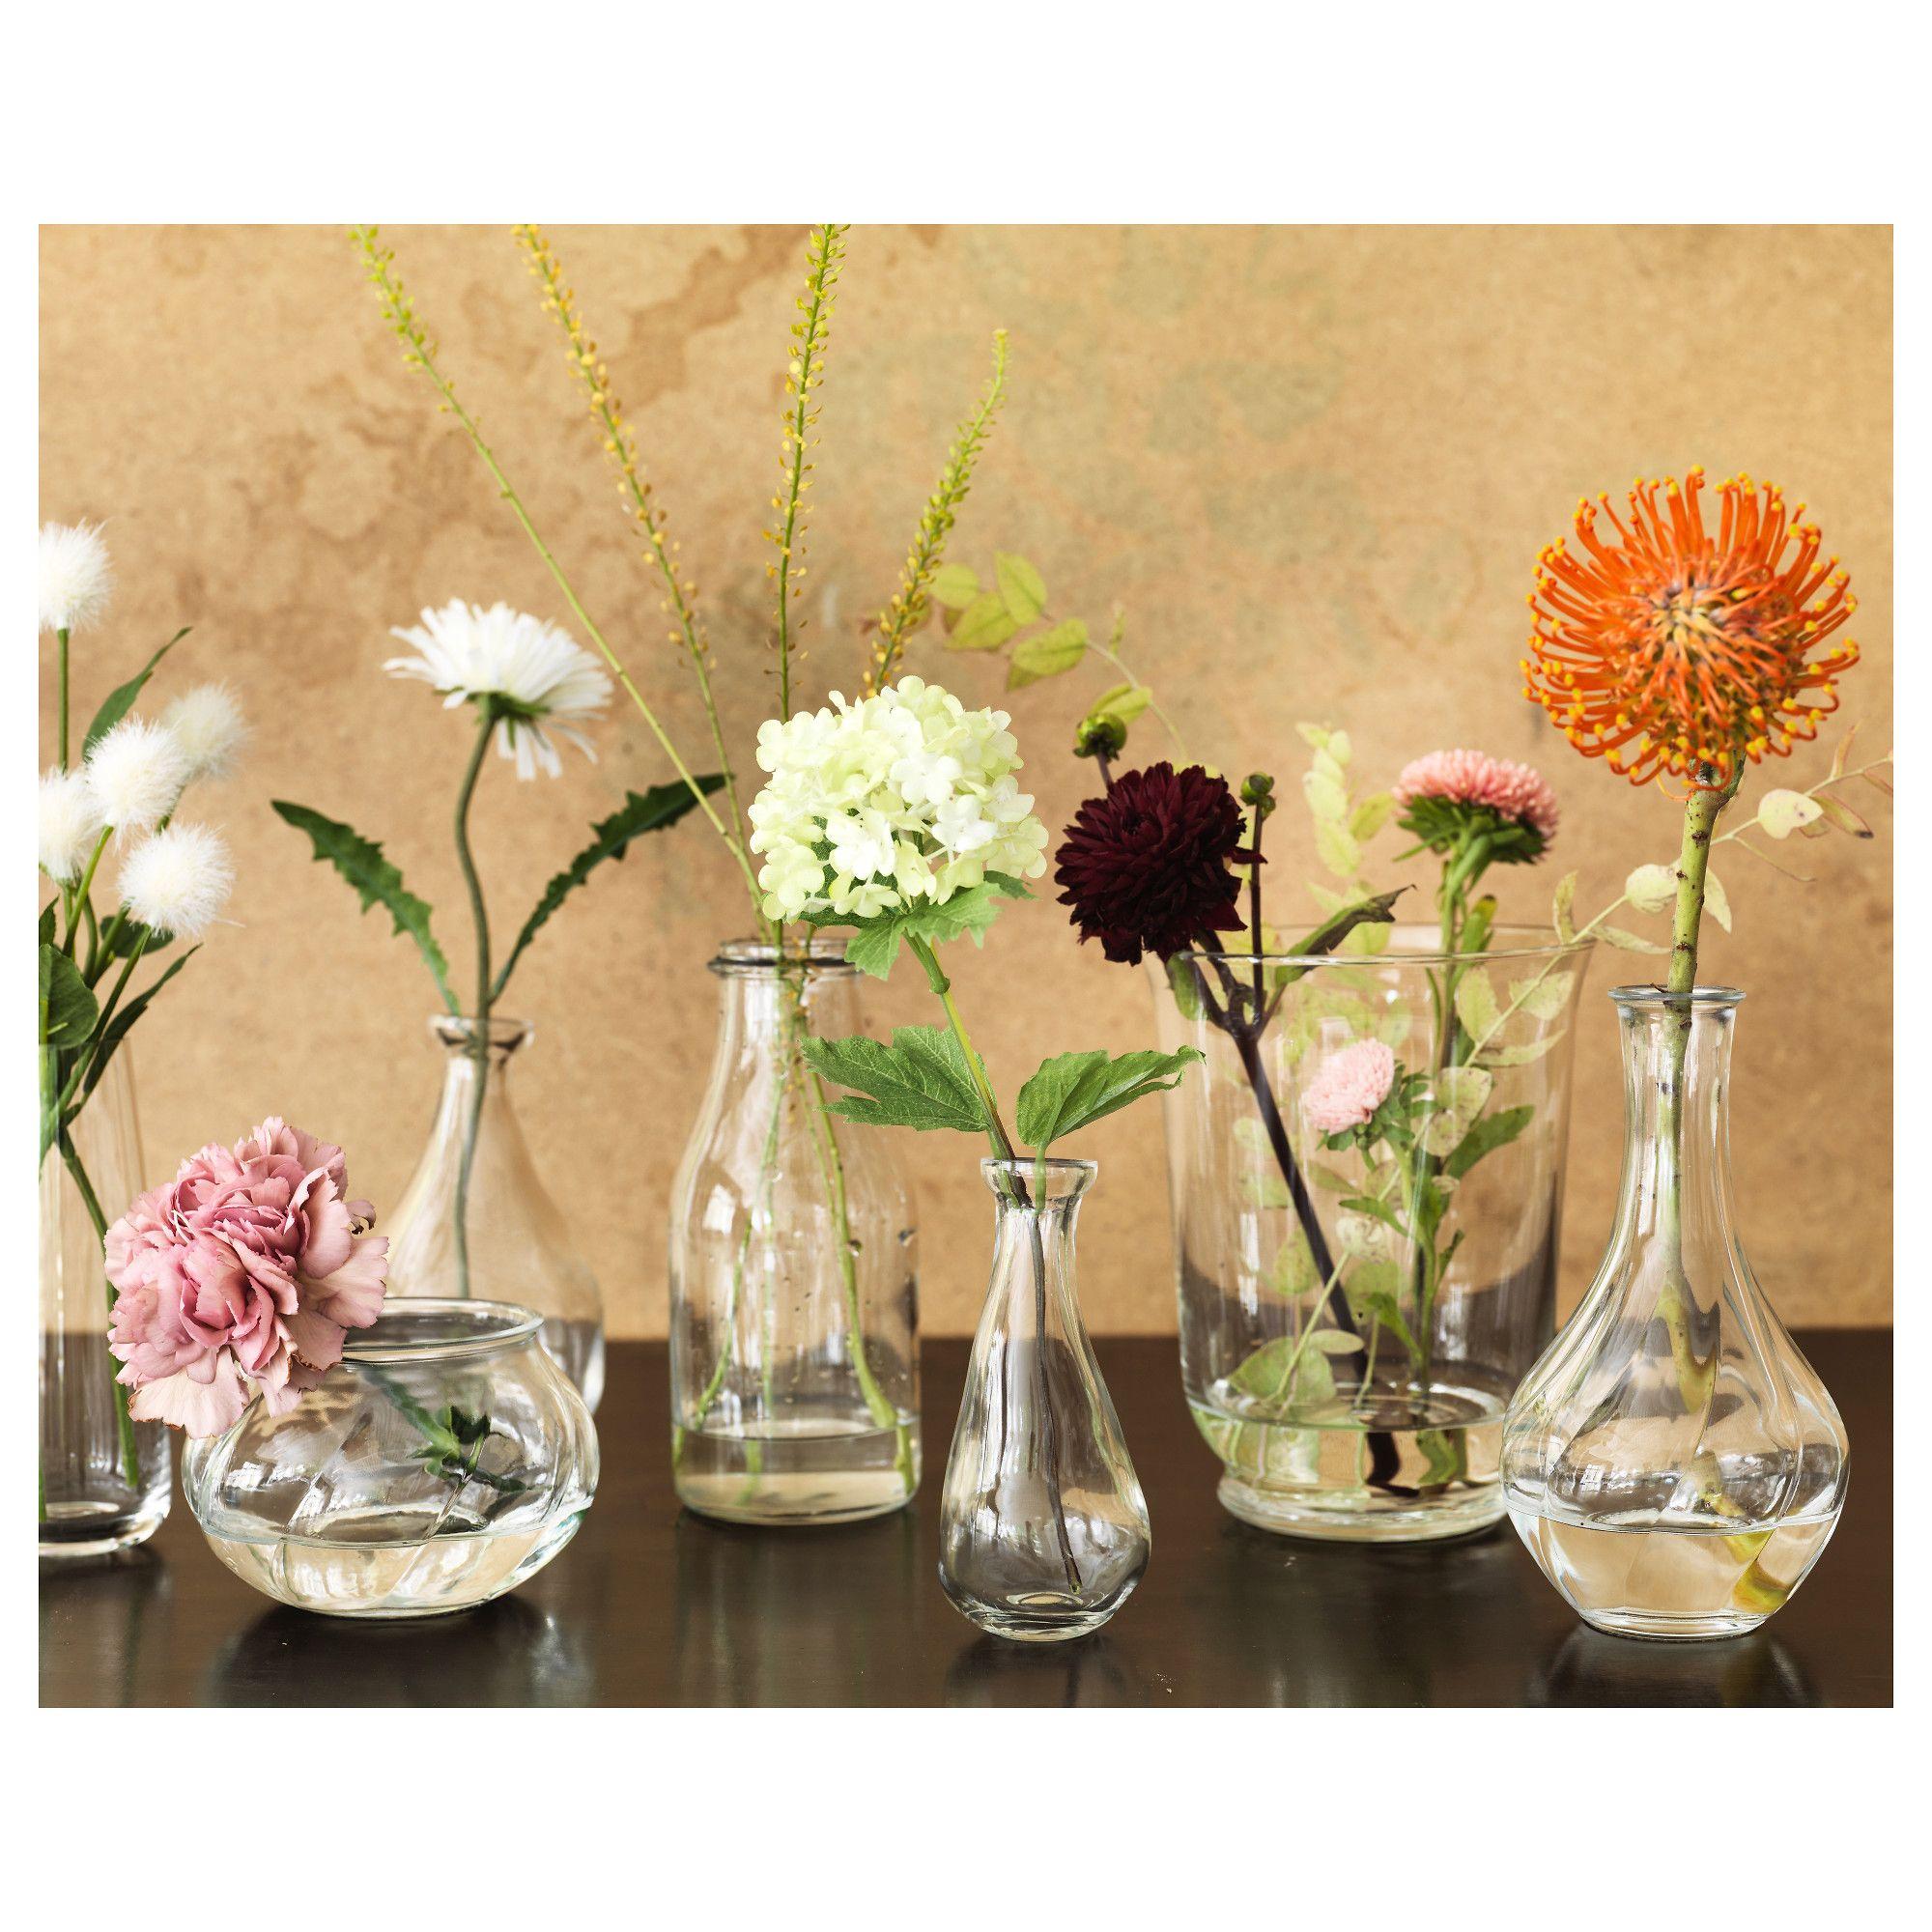 Ikea Viljestark Vase Clear Glass In 2019 Products Ikea Glass Vase Ikea Vases Wedding Vases